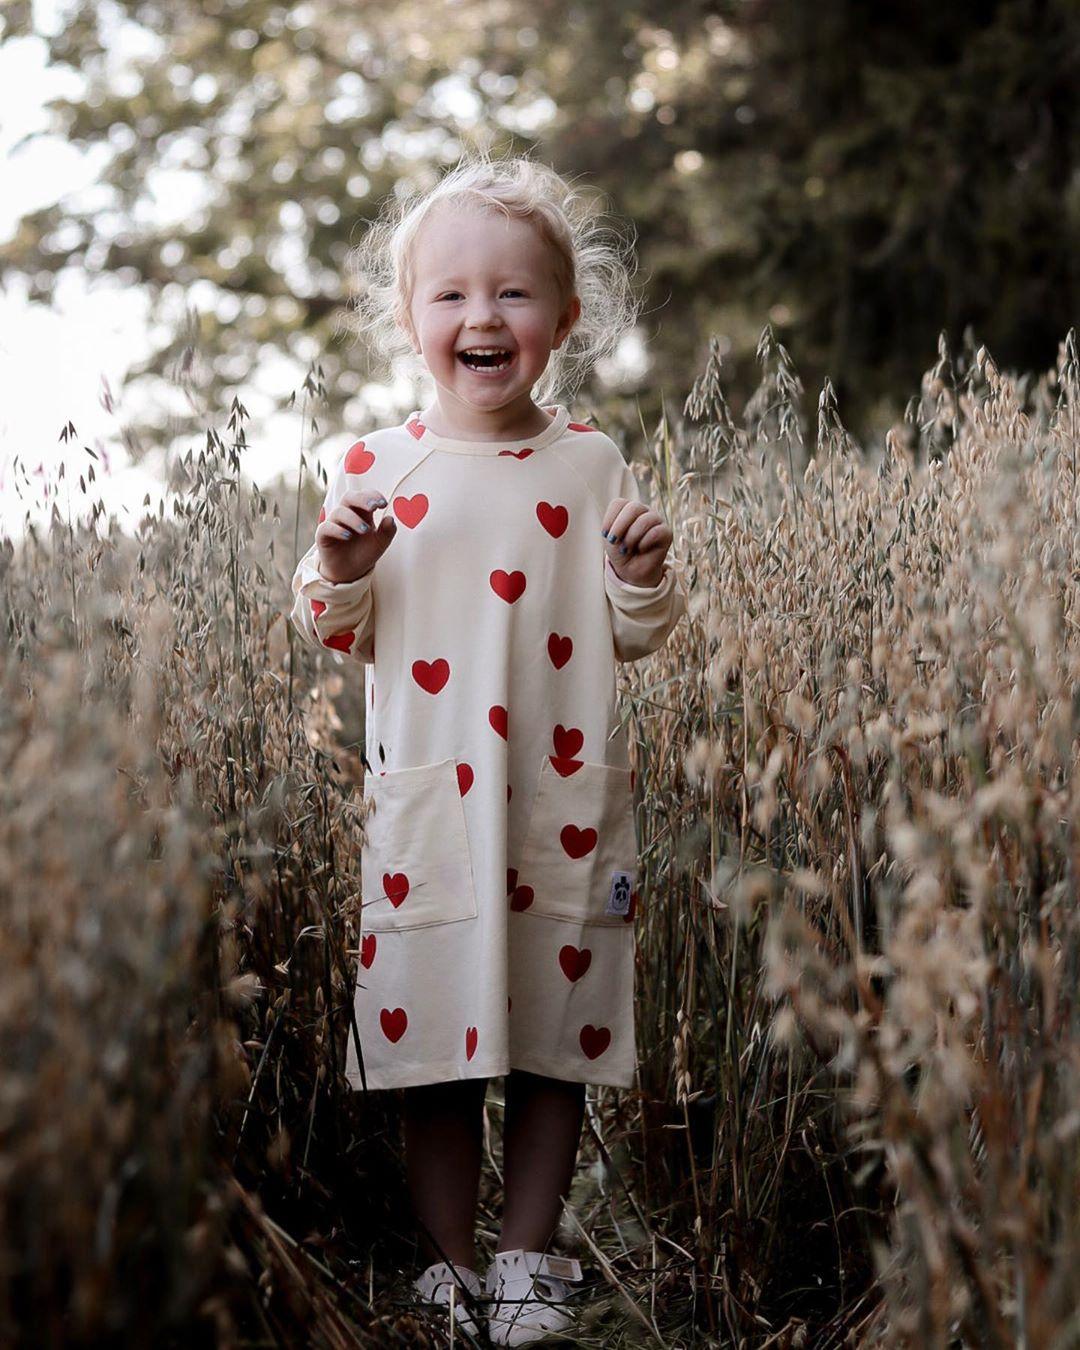 MINI Brand Kids T-shirts 2020 New Autumn Girls Heart Pattern Dress Fall Long Sleeve Cotton Fashion Baby Girl Boys Casual Dresses 6